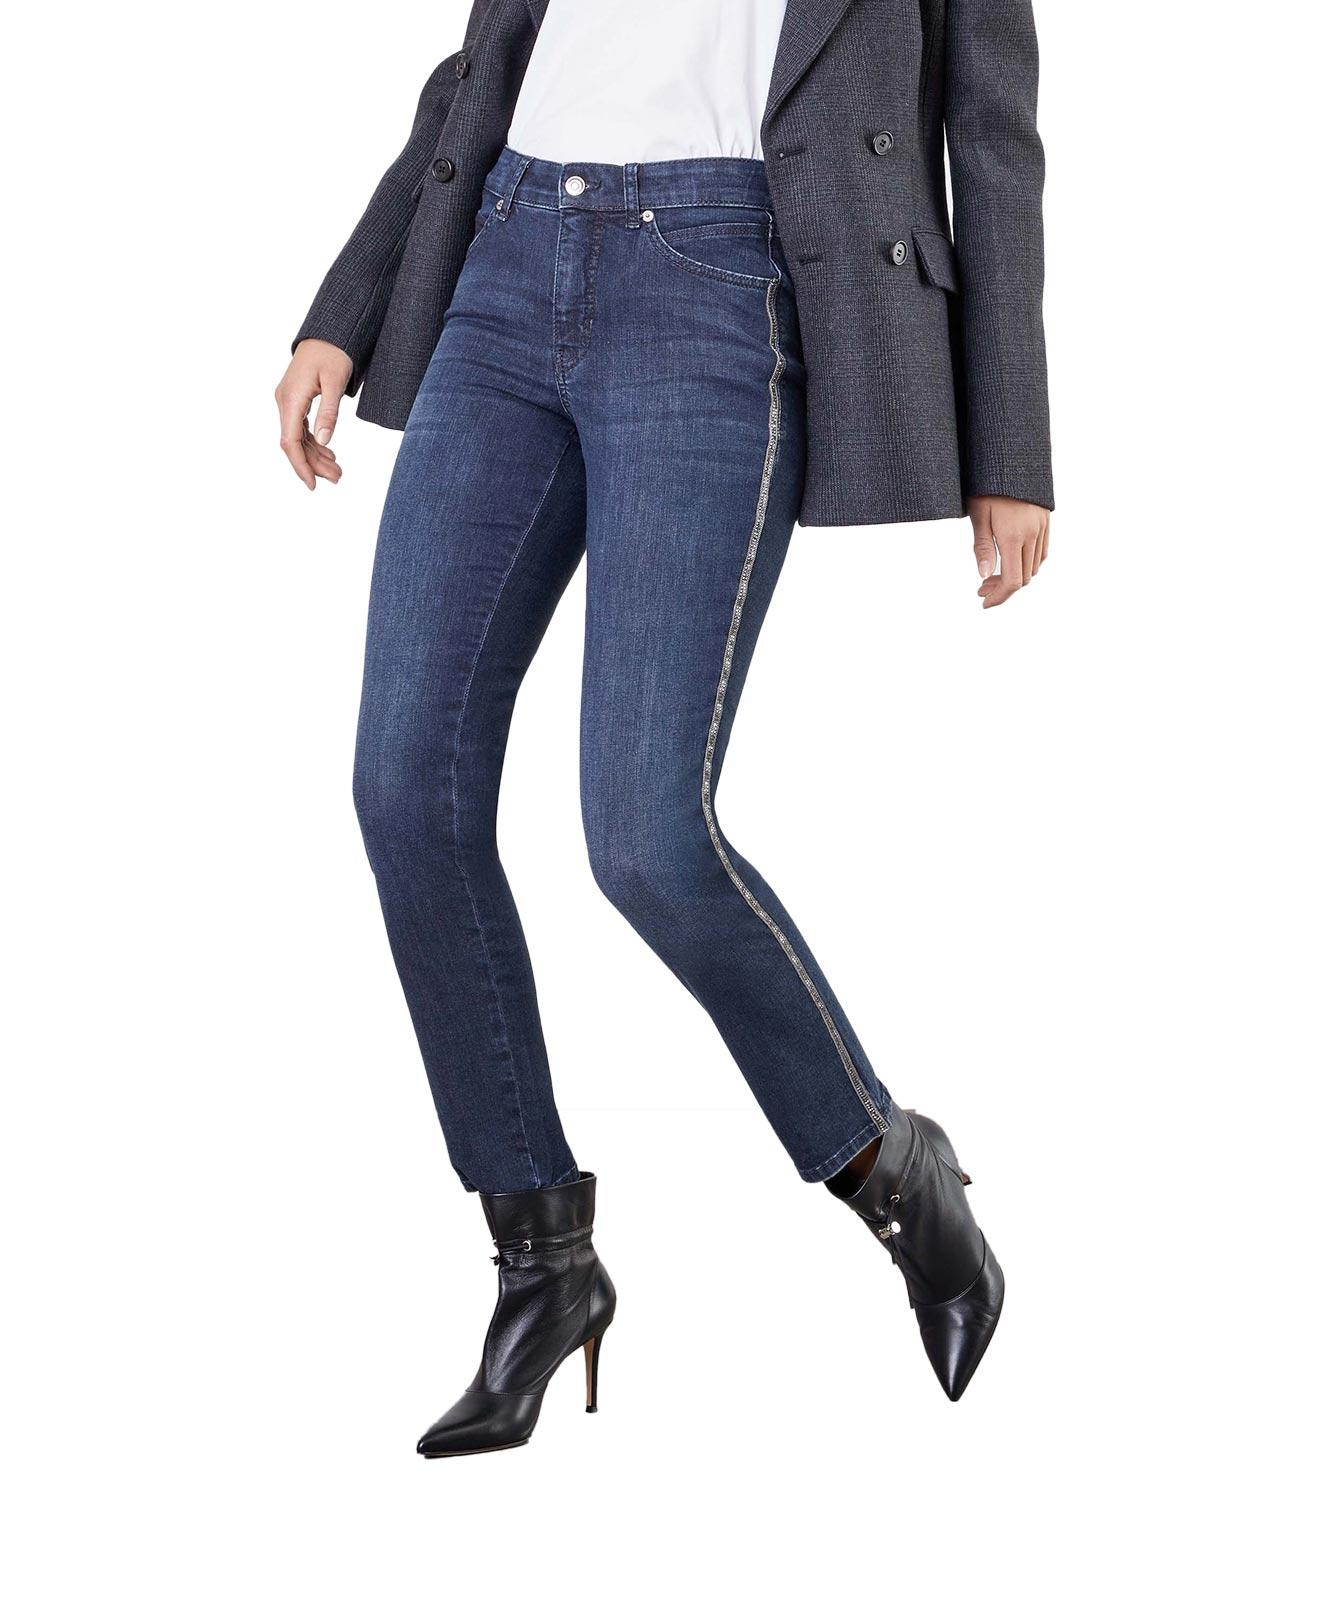 Hosen - MAC Slim Fit Jeans Melanie New in Dark Blue Authentic Wash  - Onlineshop Jeans Meile